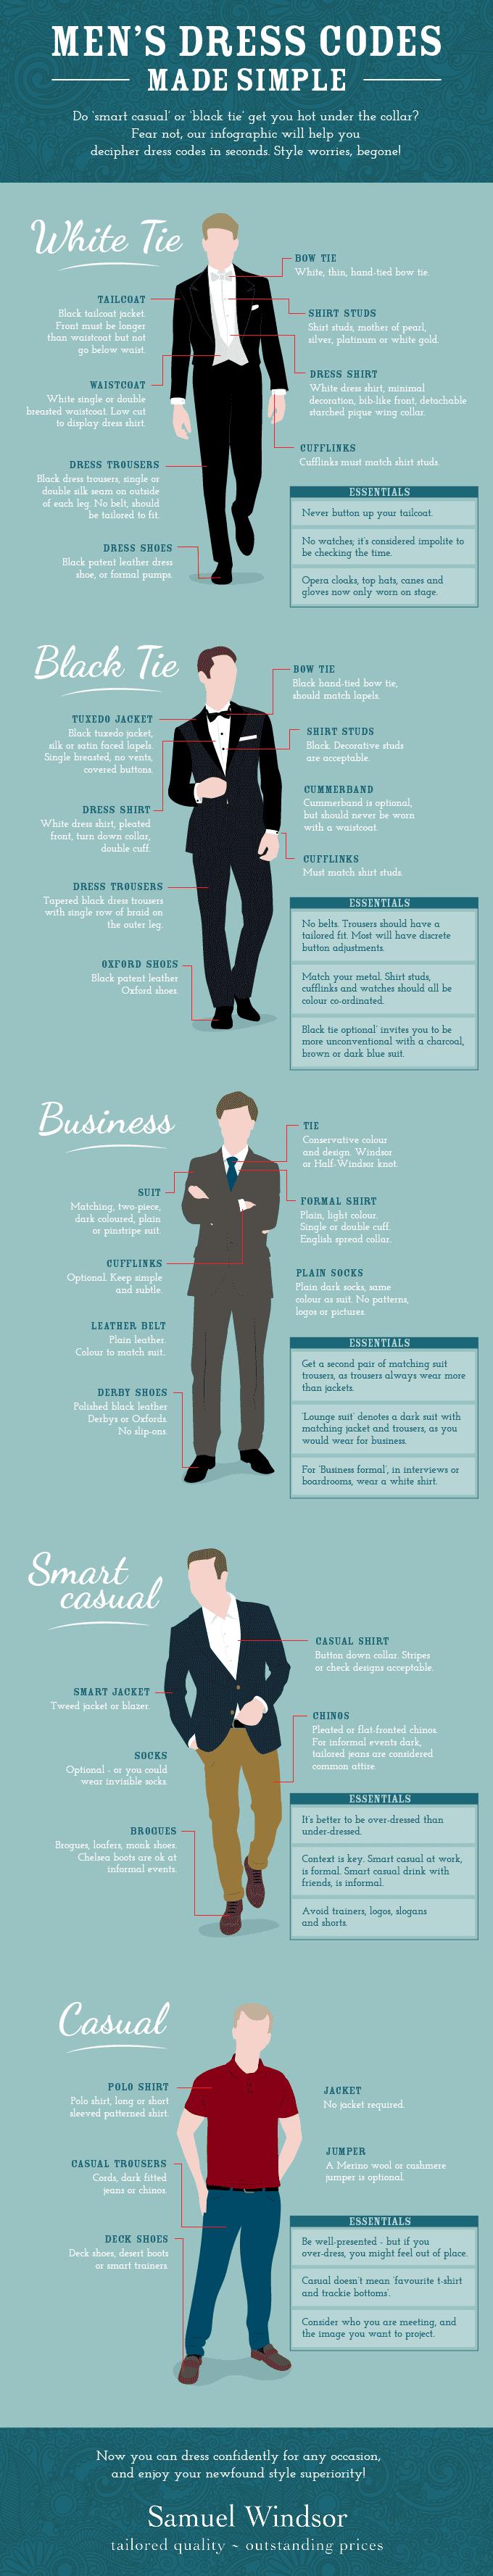 mens-dress-code-infographic-4548411